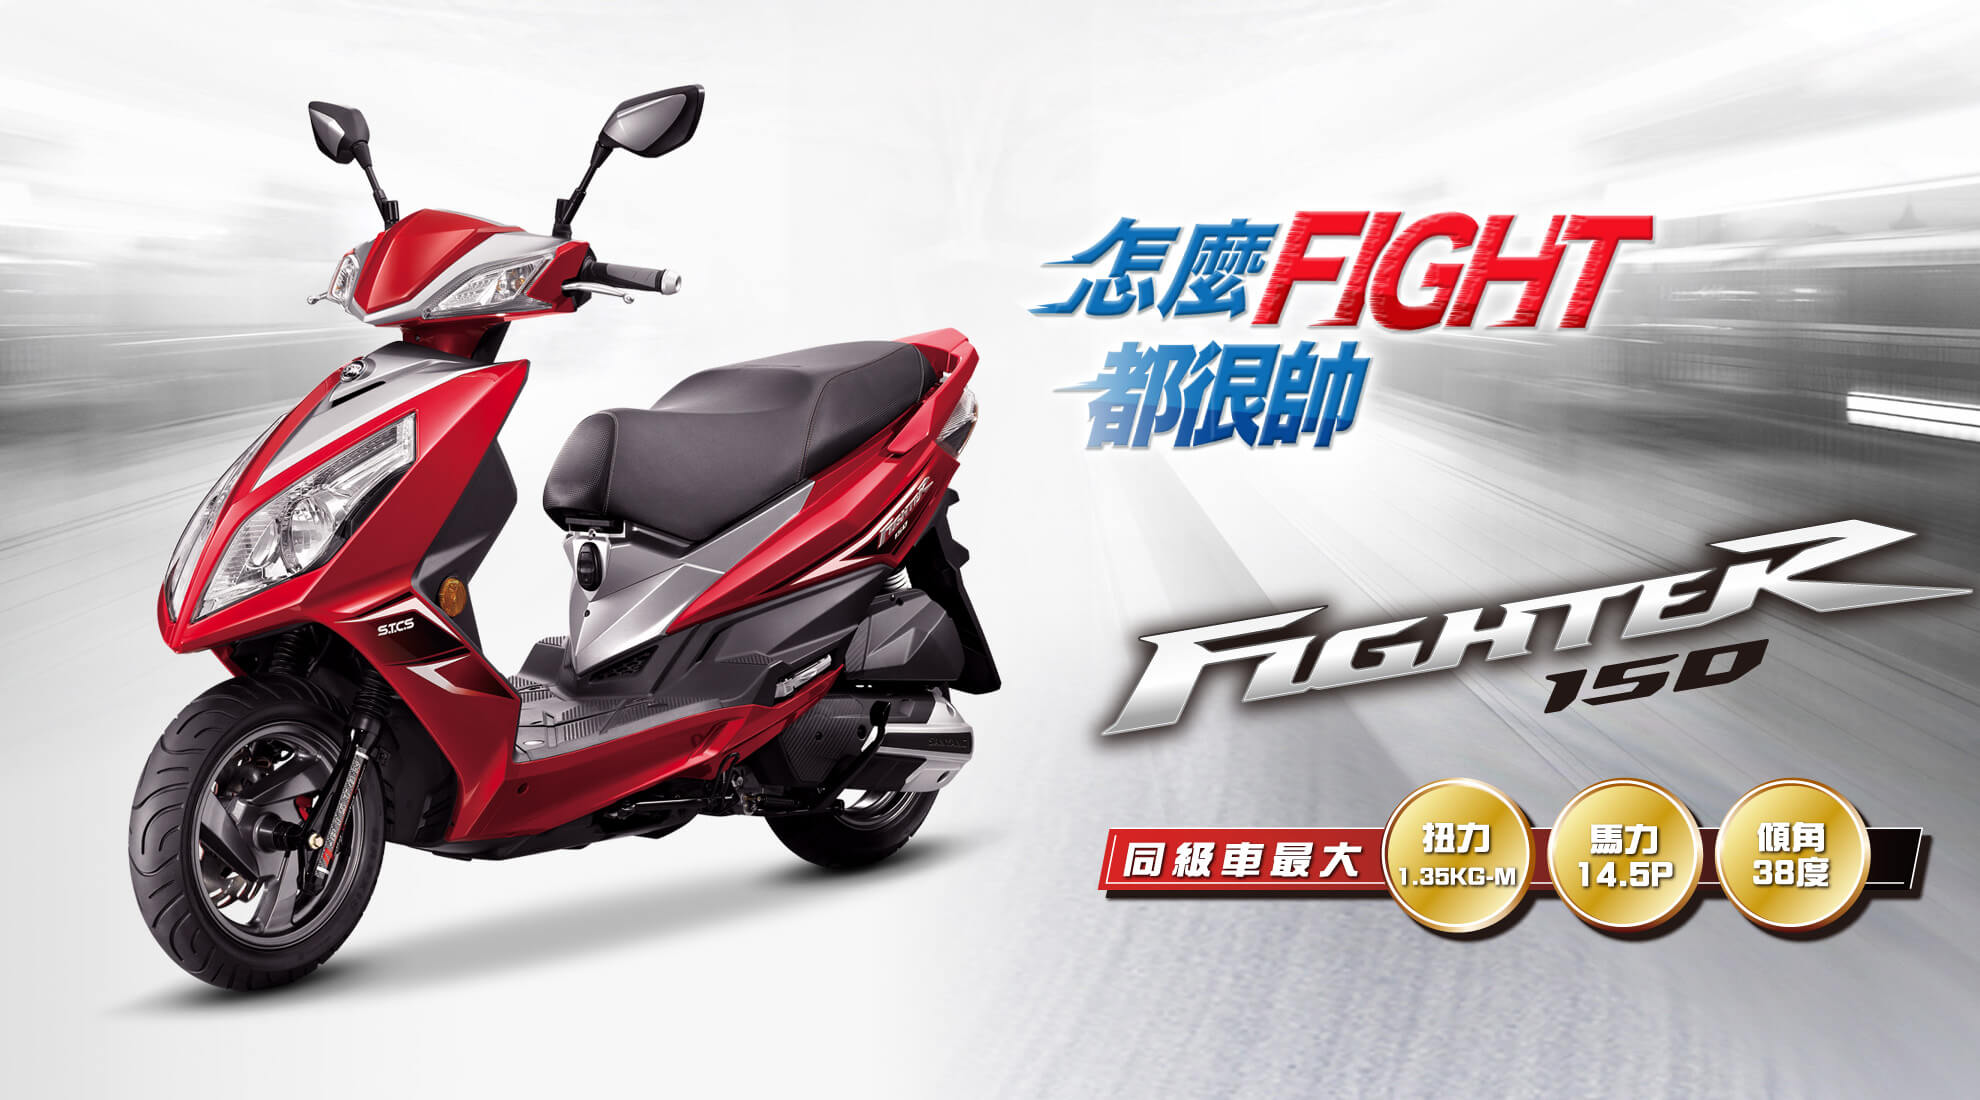 SYM 六代Fighter 150雙碟 ABS